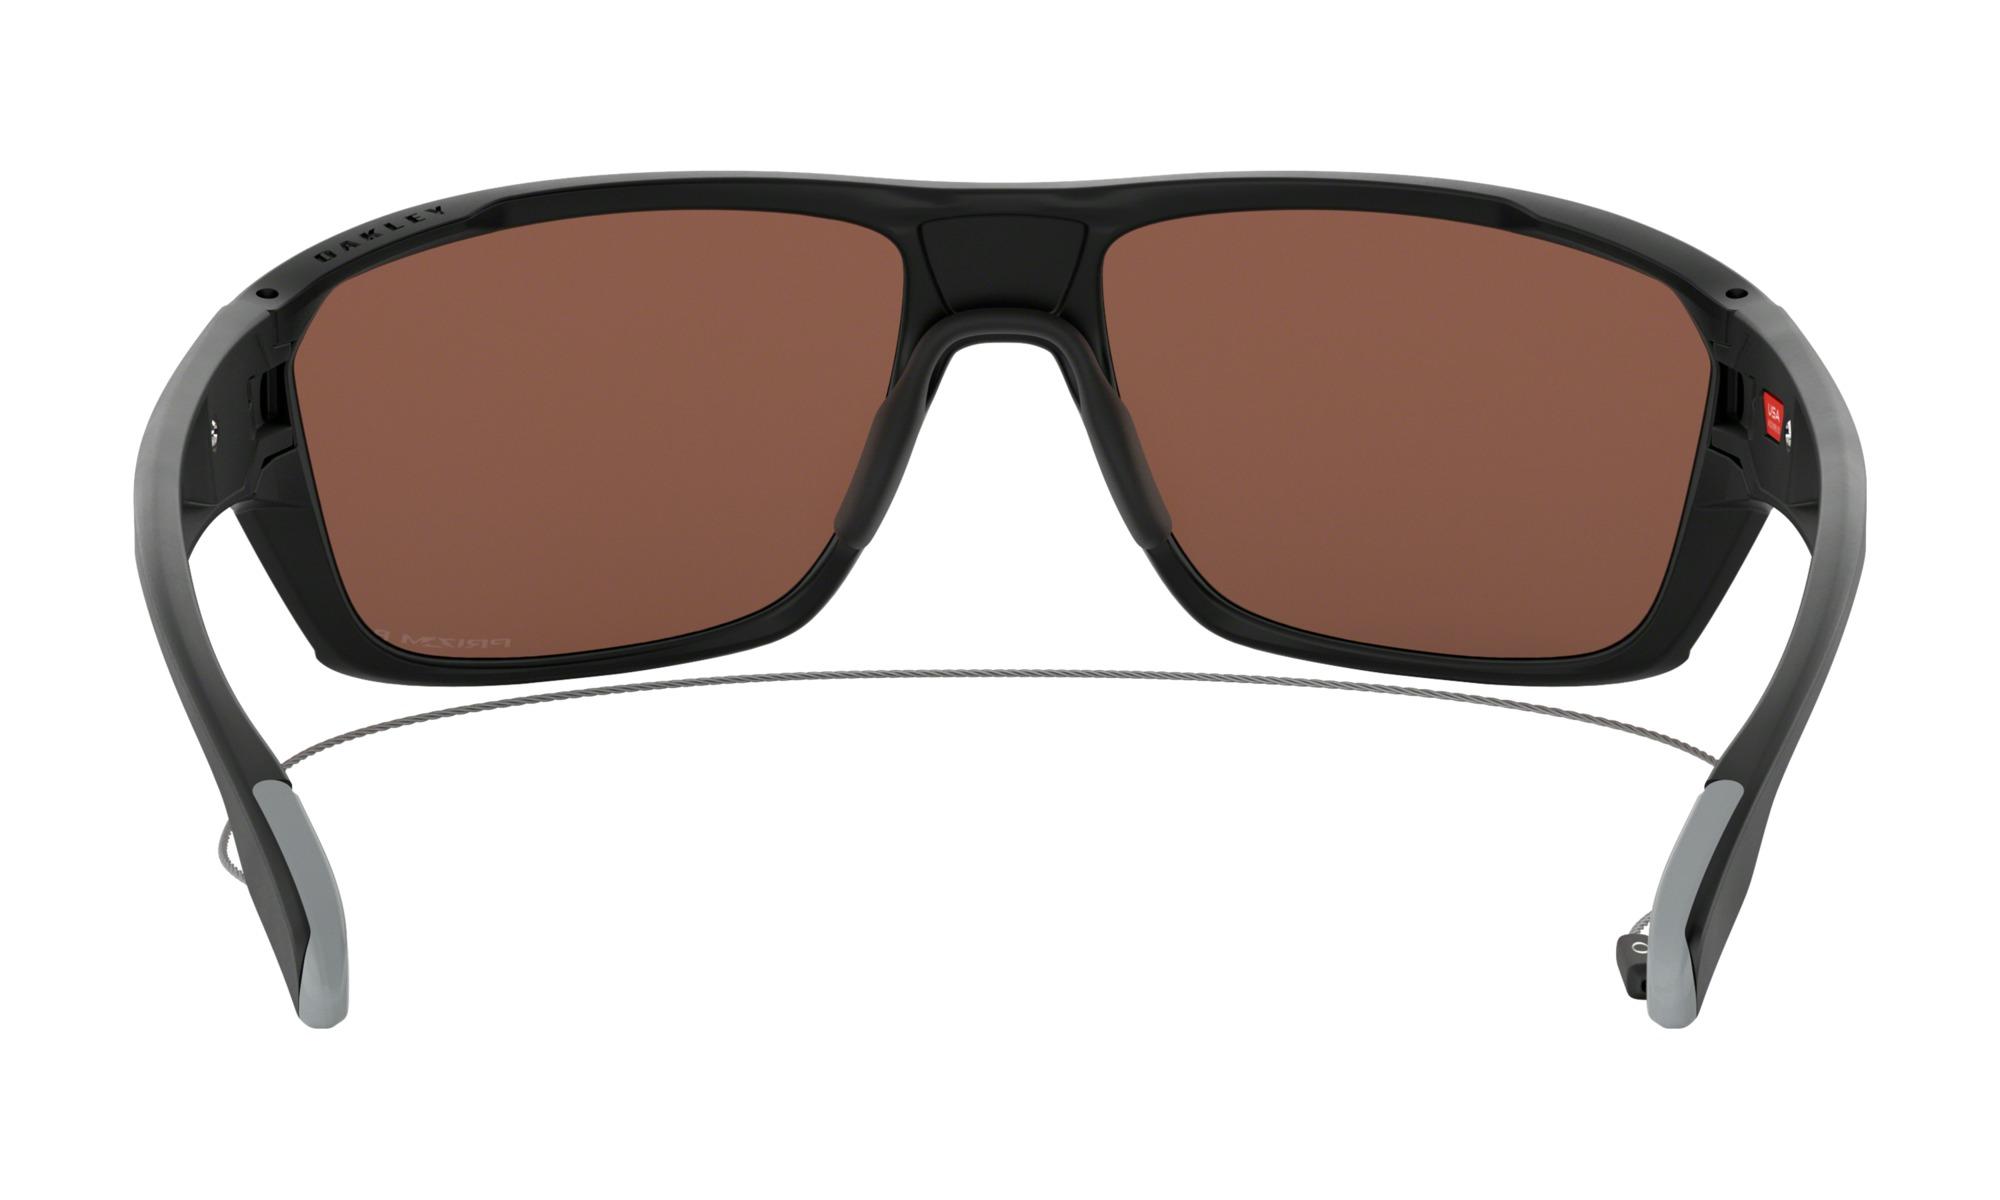 9f7d32c663f2 Braasport - Oakley Split Shot Matte Black   Prizm Deep Water Polarized  solbriller